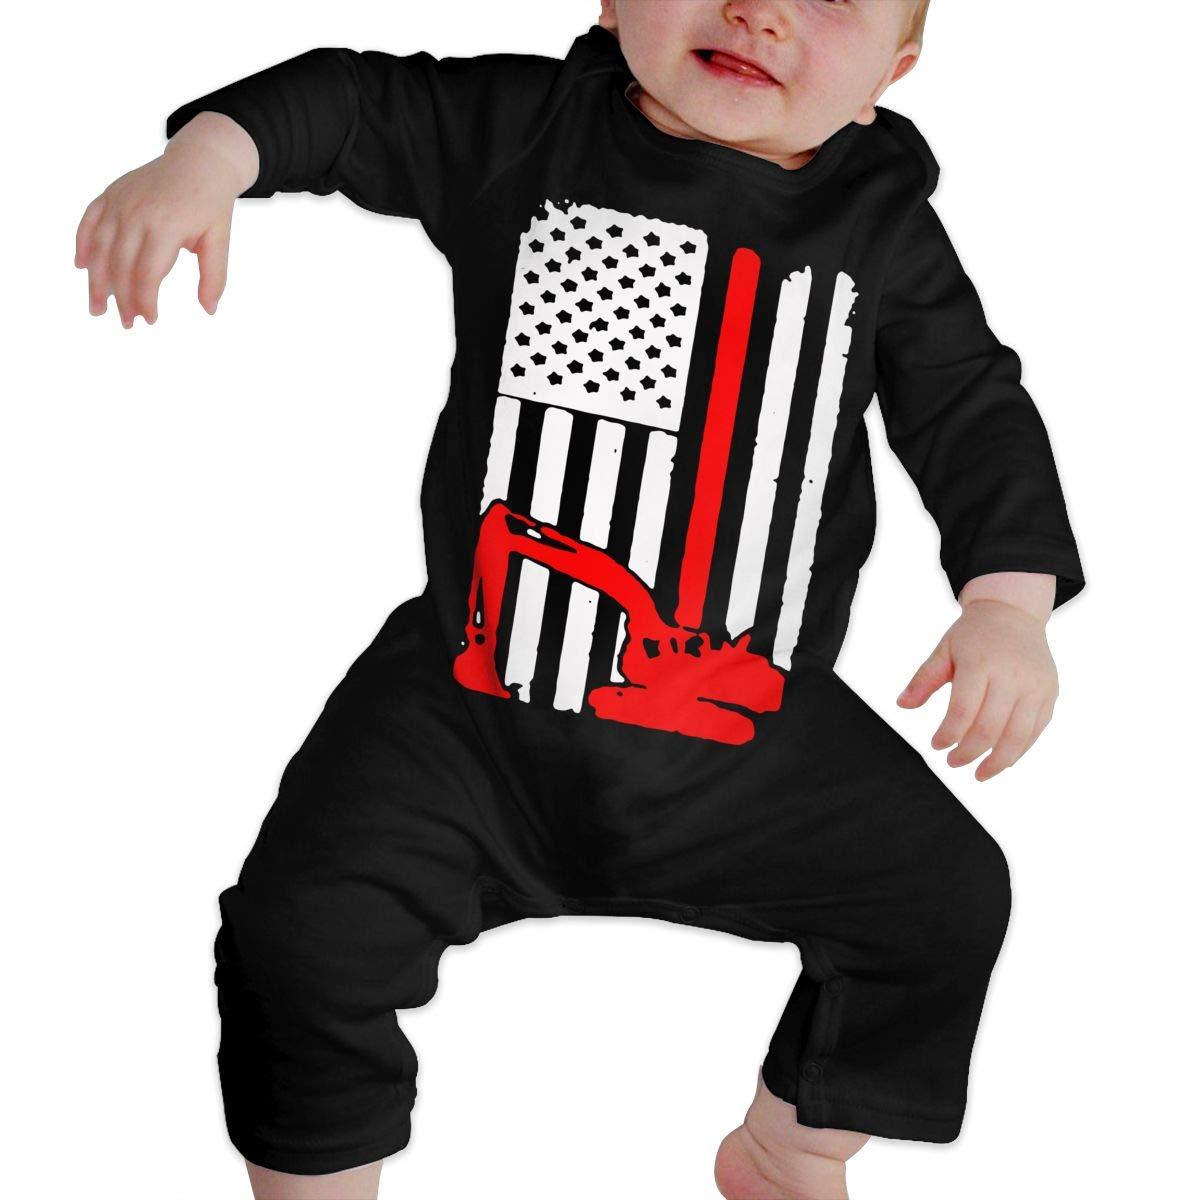 UGFGF-S3 Excavator and American Flag Toddler Baby Long Sleeve Romper Jumpsuit Bodysuits Onsies